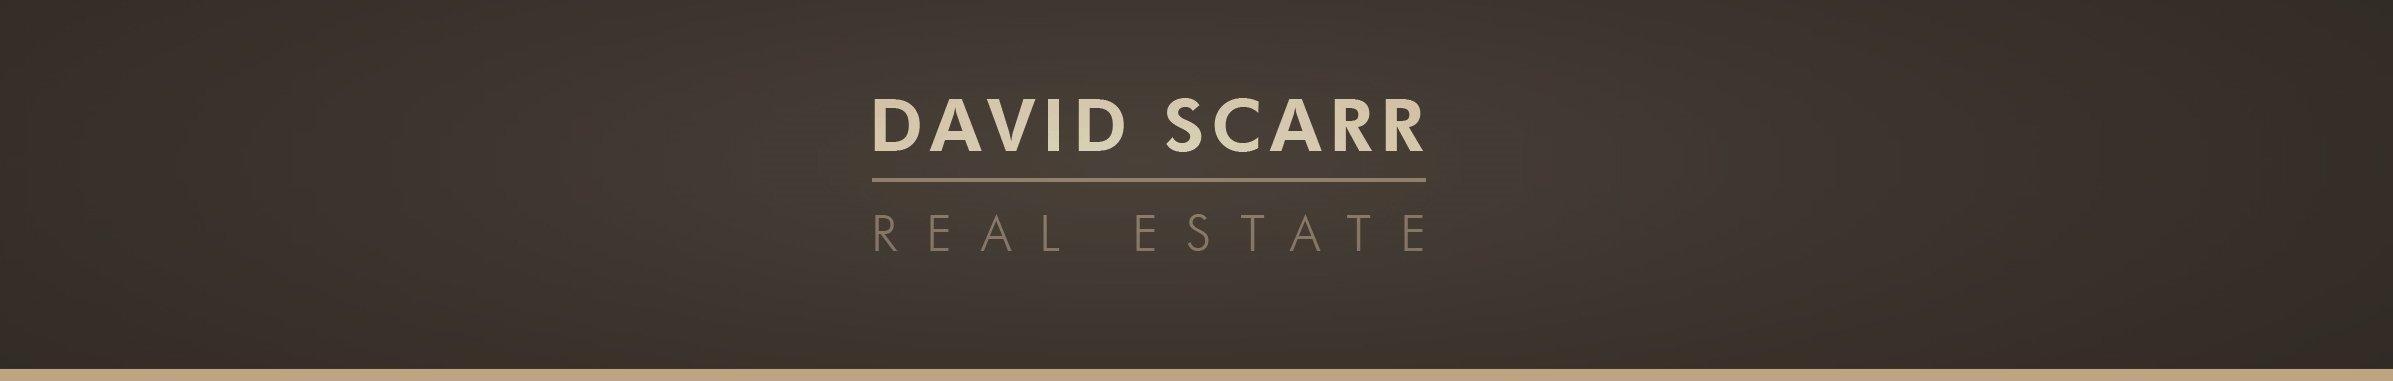 David Scarr